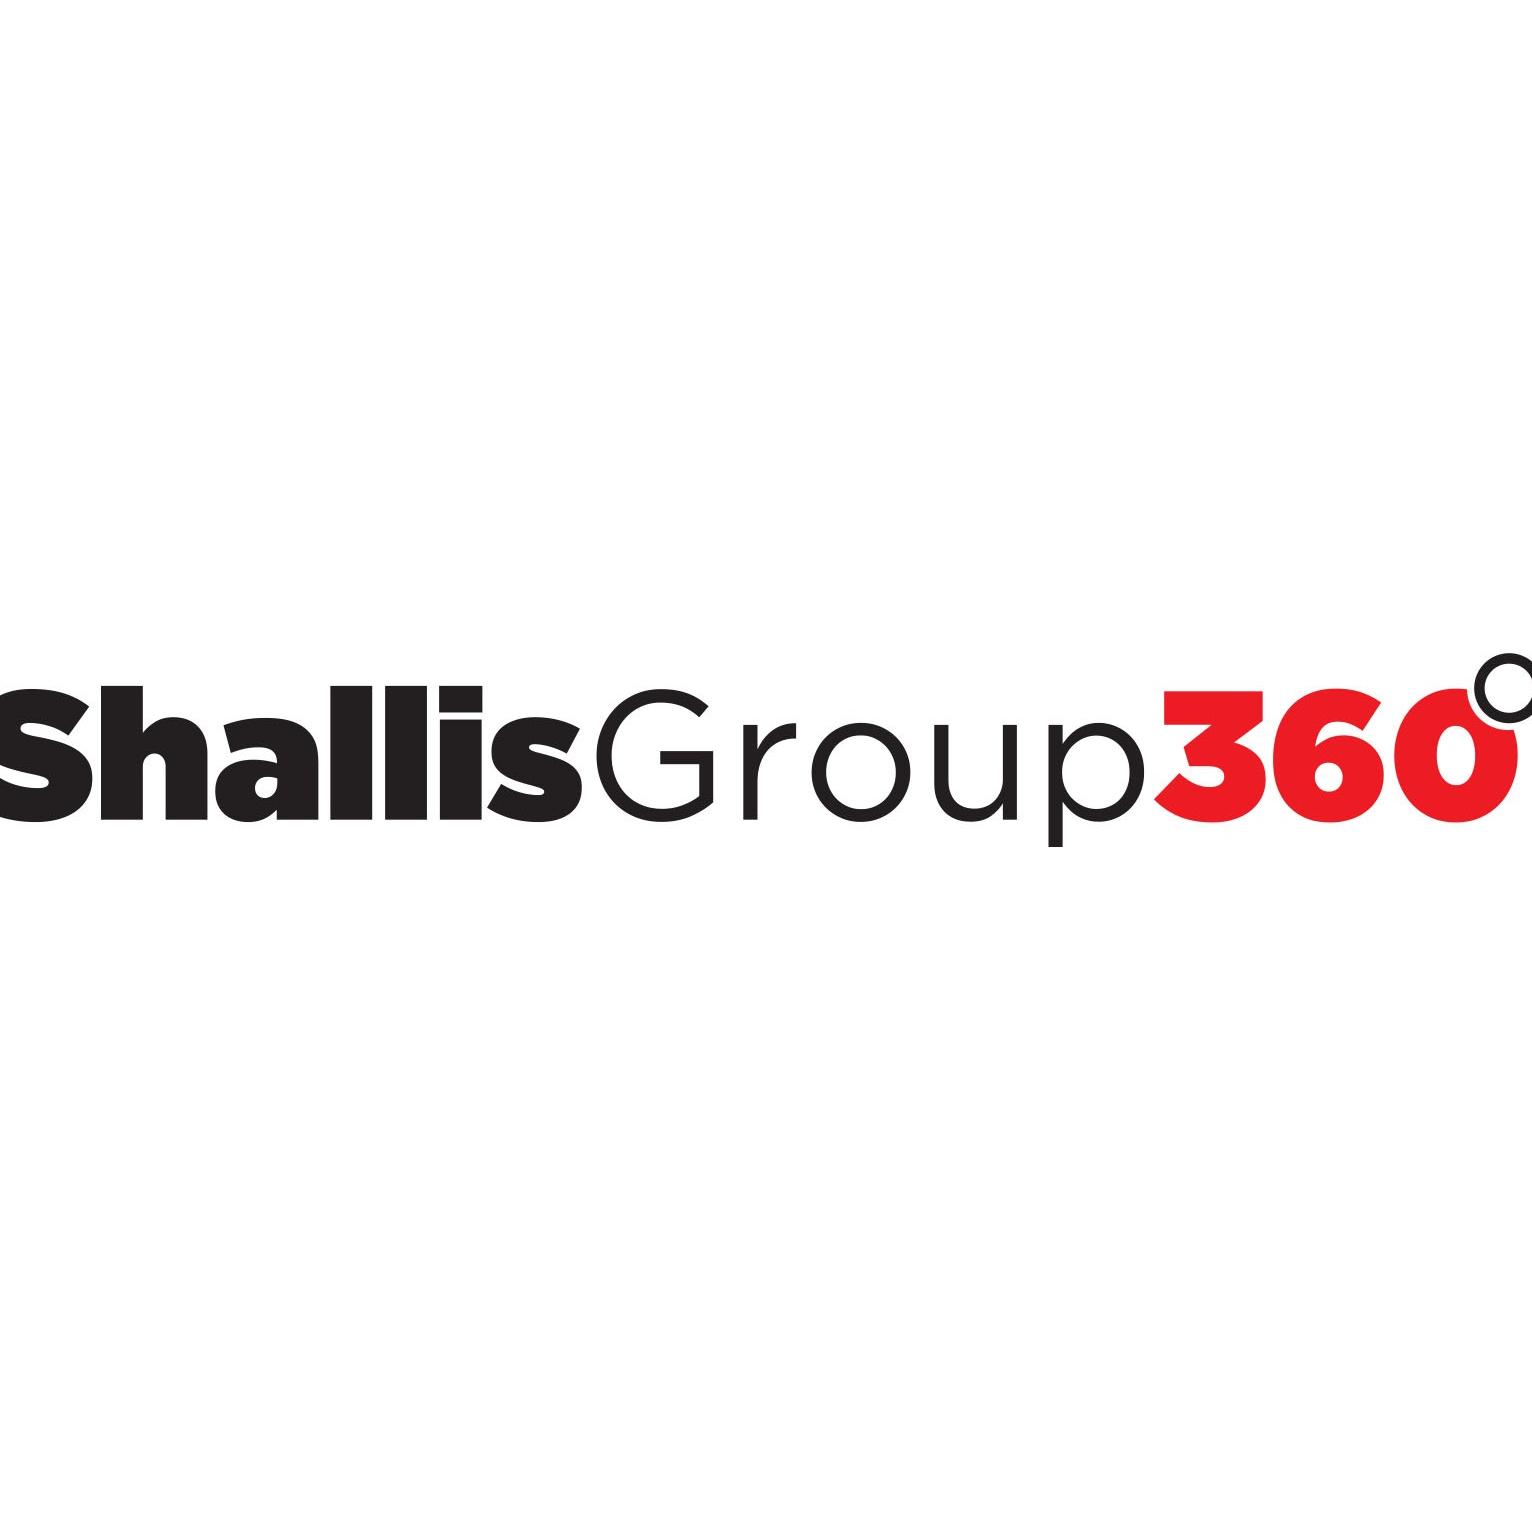 ShallisGroup360°